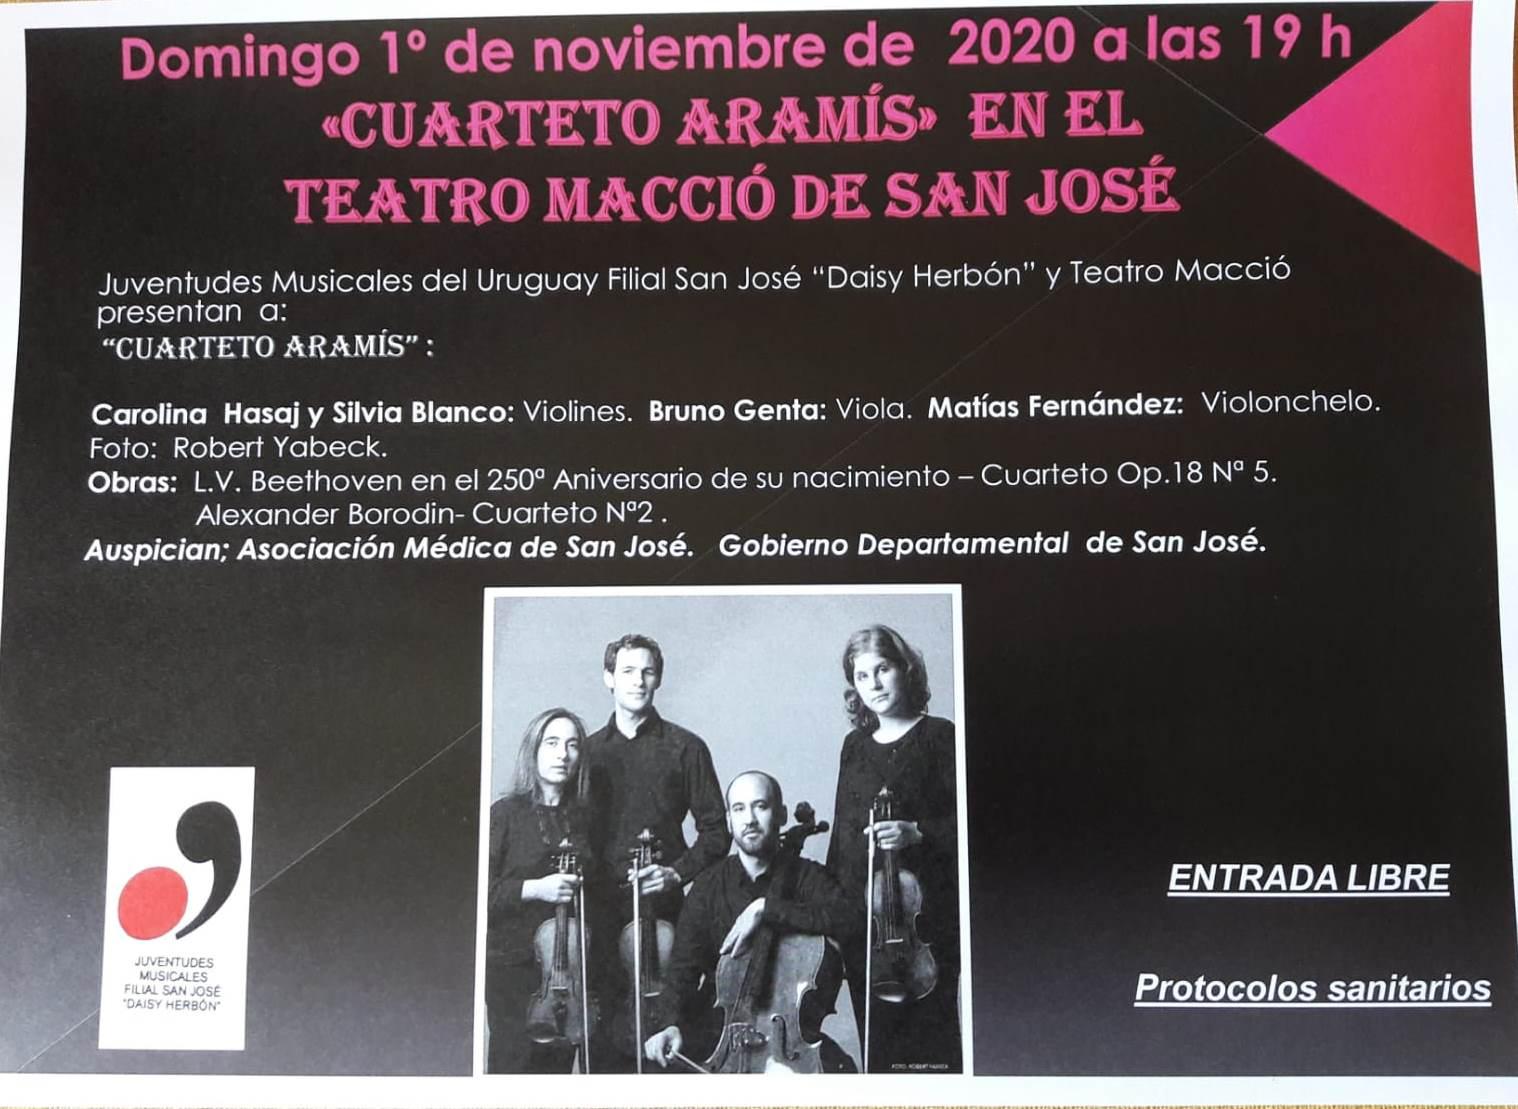 Afiche del concierto del Cuarteto Aramís del 1º -11- 2020 en el Macció